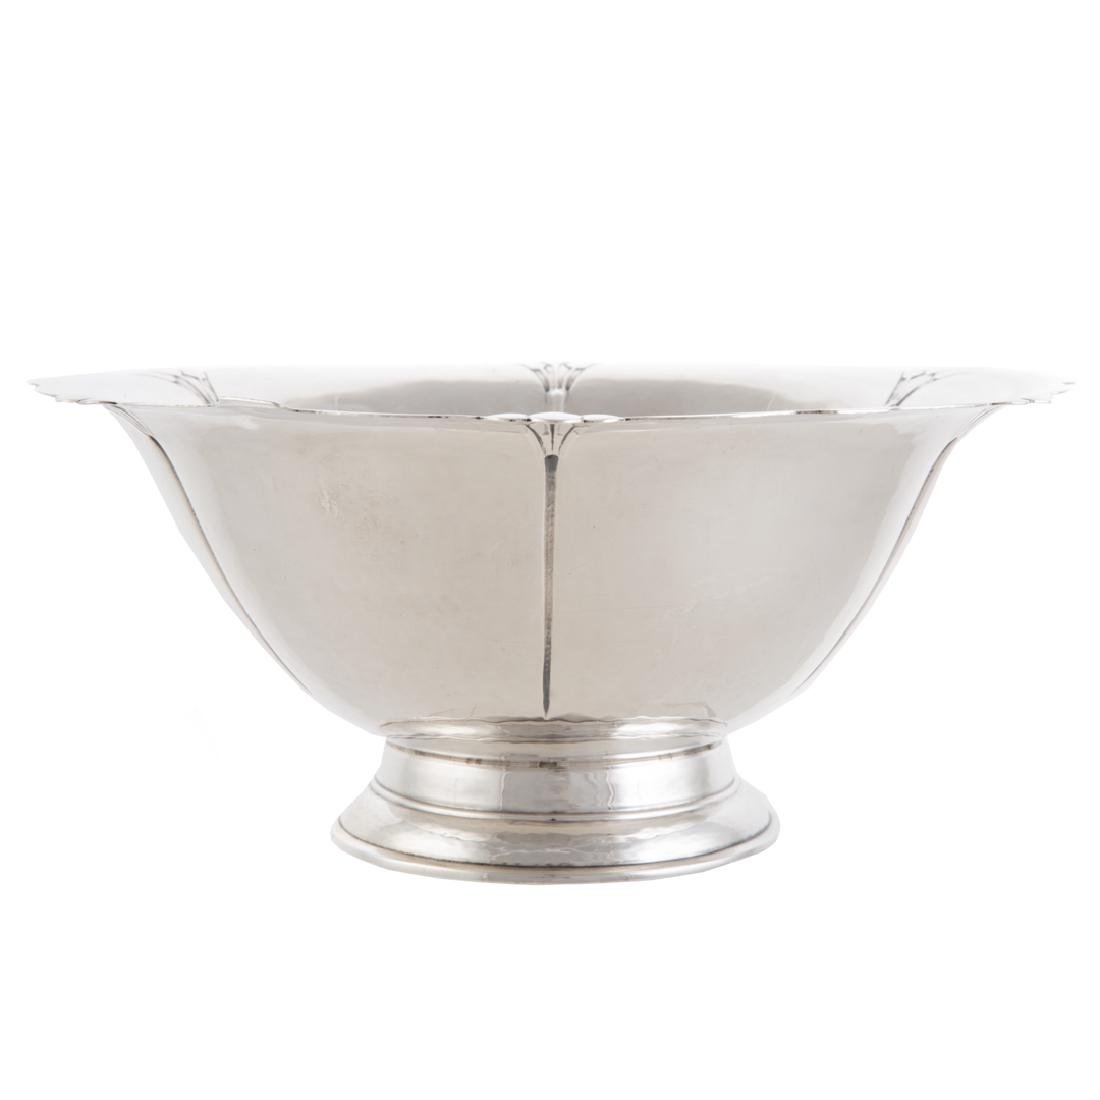 Georg Jensen style hammered sterling center bowl